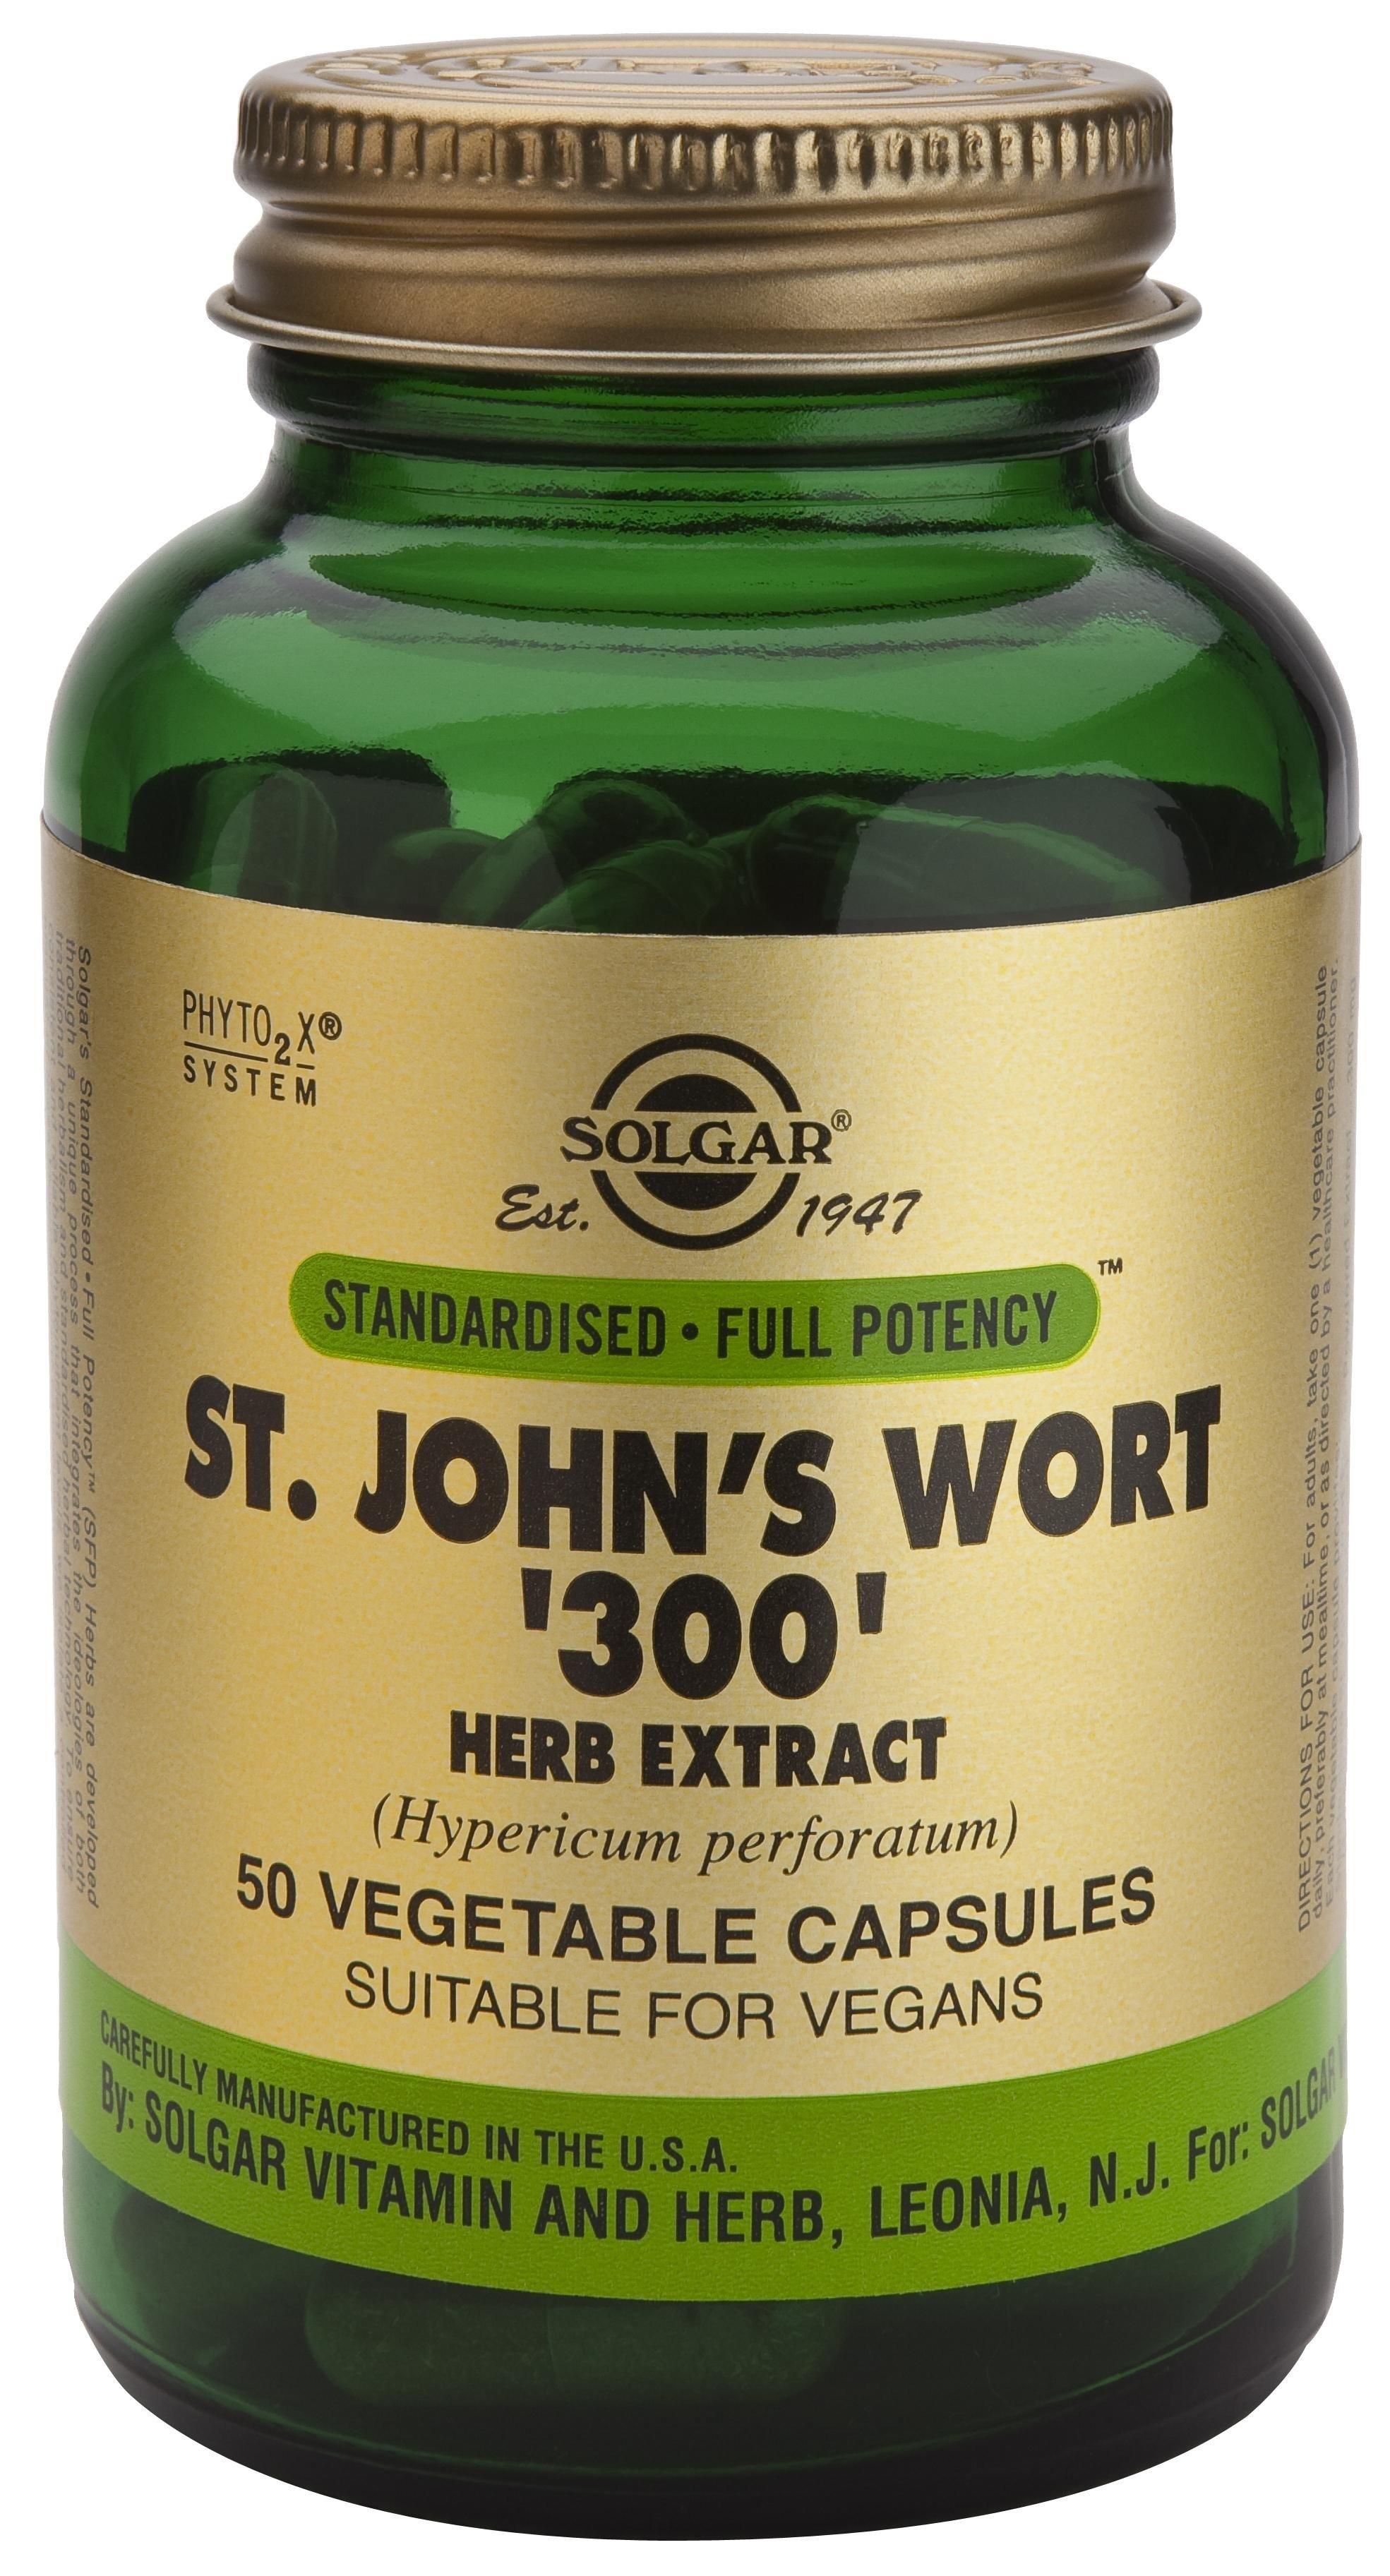 Solgar Sfp St. John's Wort Herb Extract Συμπλήρωμα Διατροφής με Αντικαταθλιπτικές Ιδιότητες veg.caps – 175mg 60veg.caps